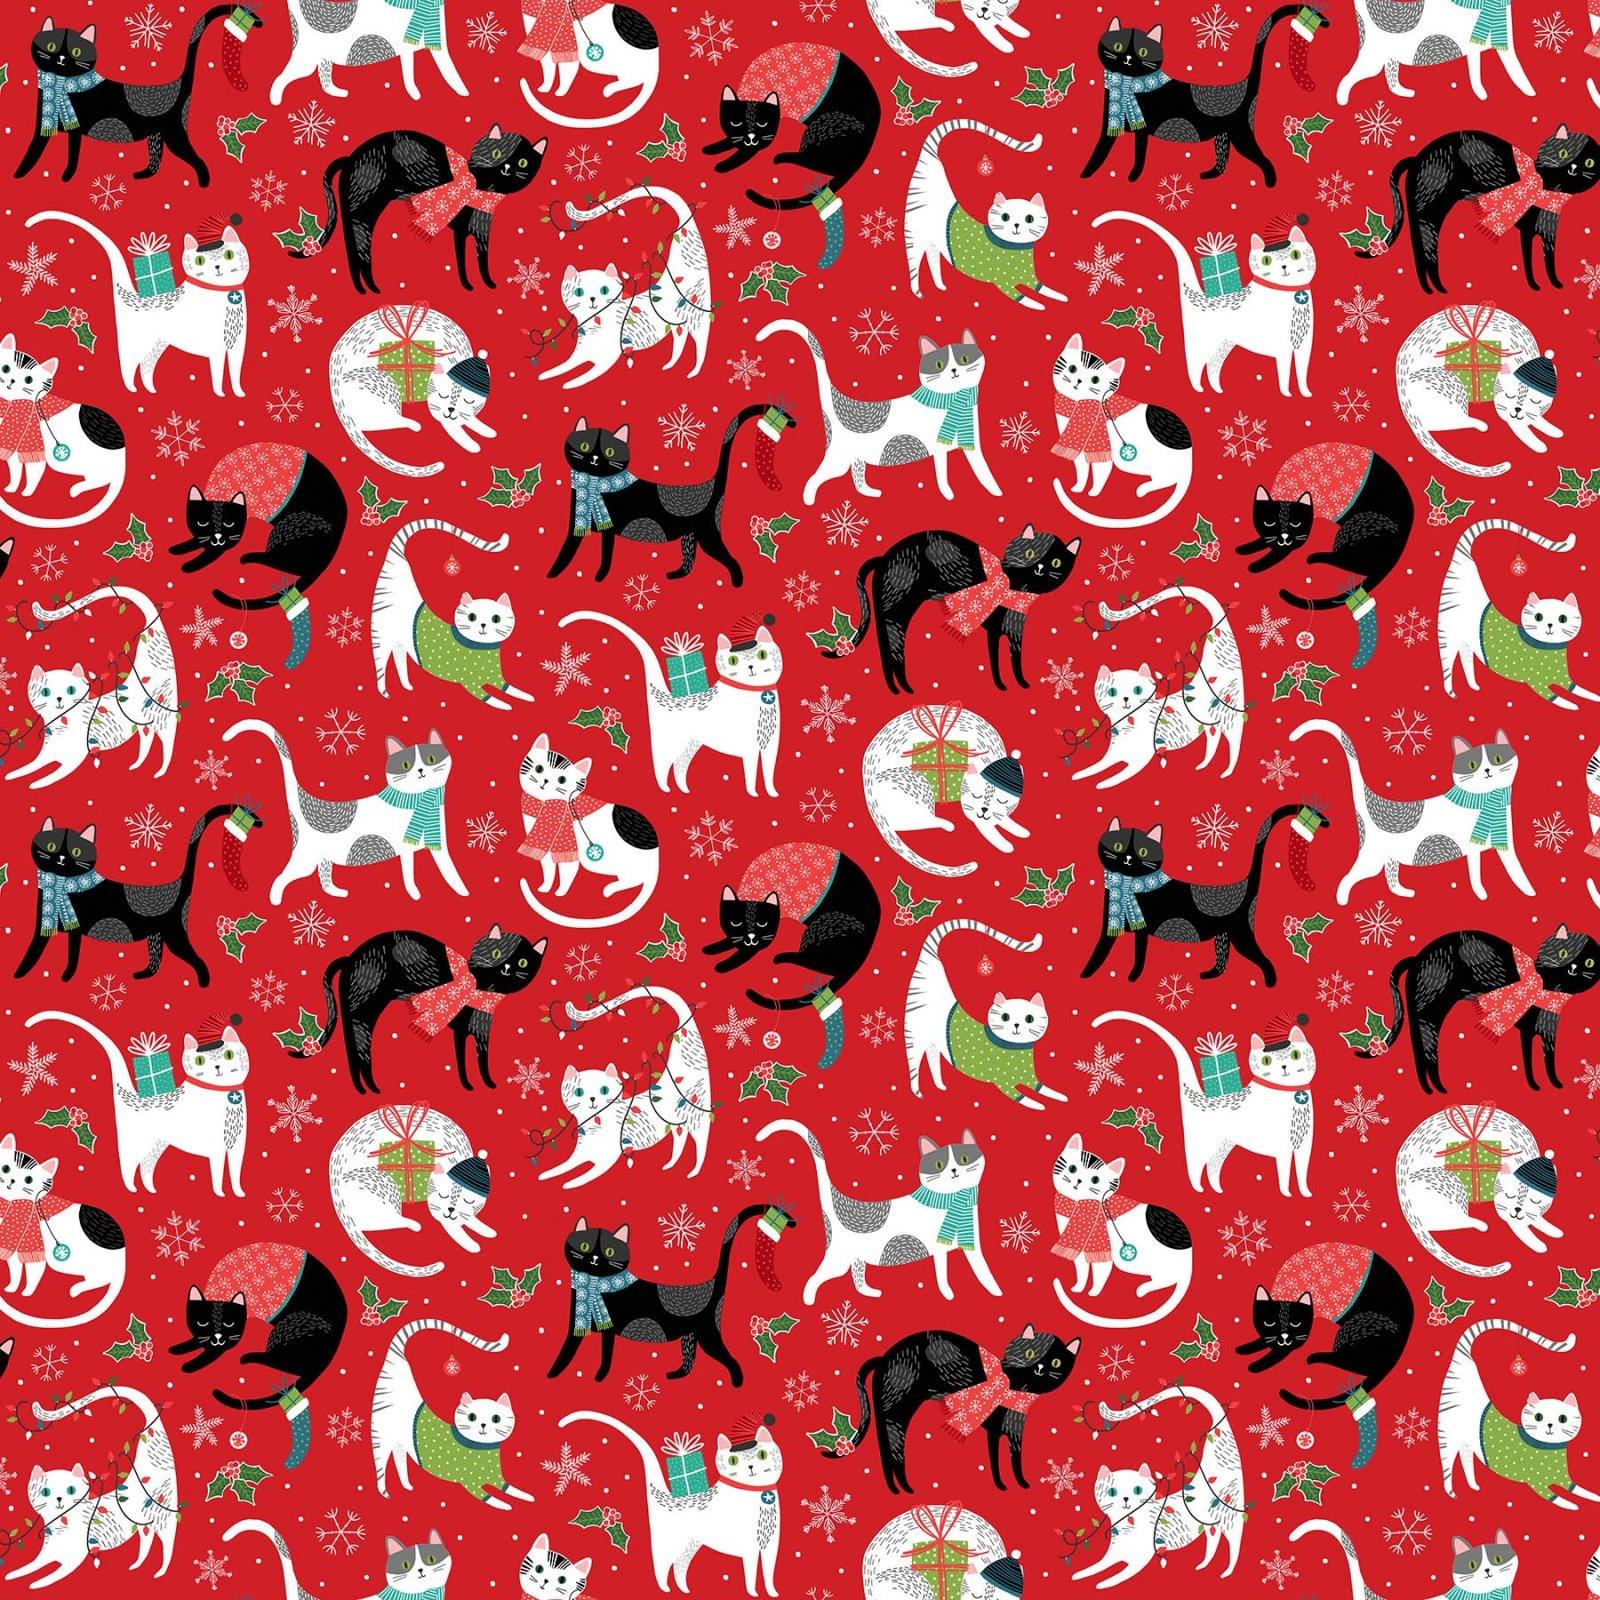 Santa Paws 24150-24 Red